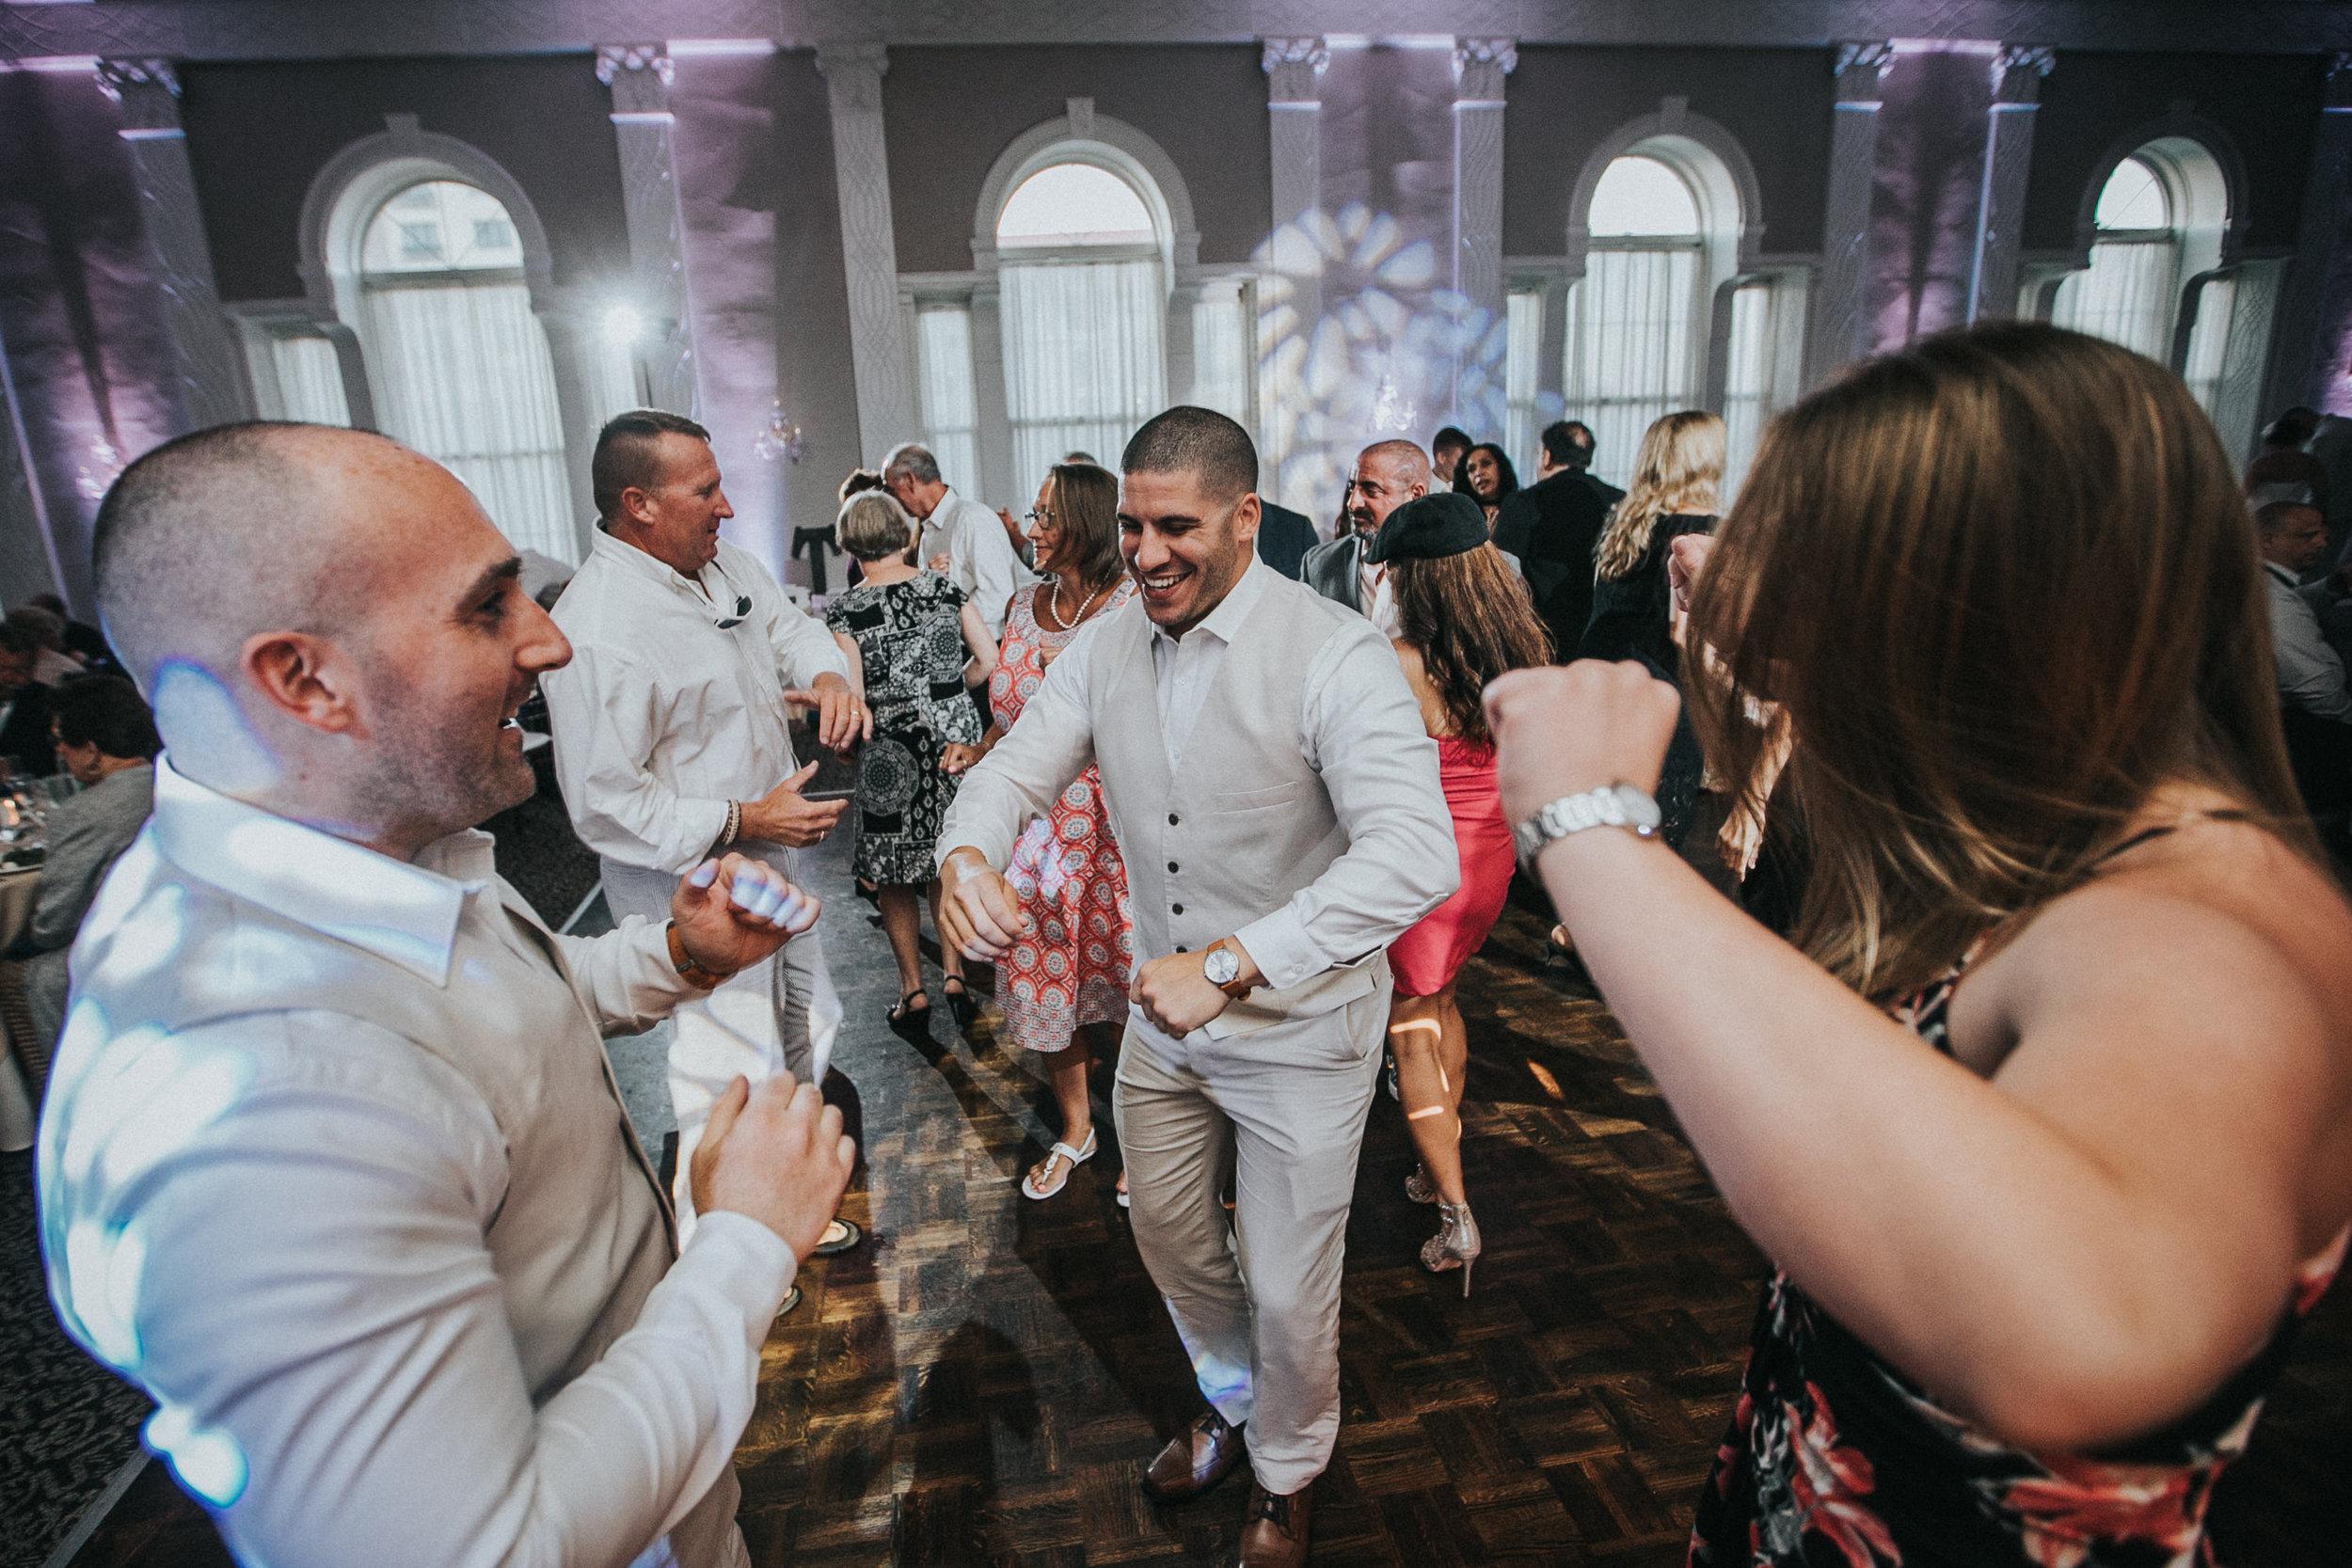 JennaLynnPhotography-NJWeddingPhotographer-Wedding-TheBerkeley-AsburyPark-Allison&Michael-Reception-111.jpg